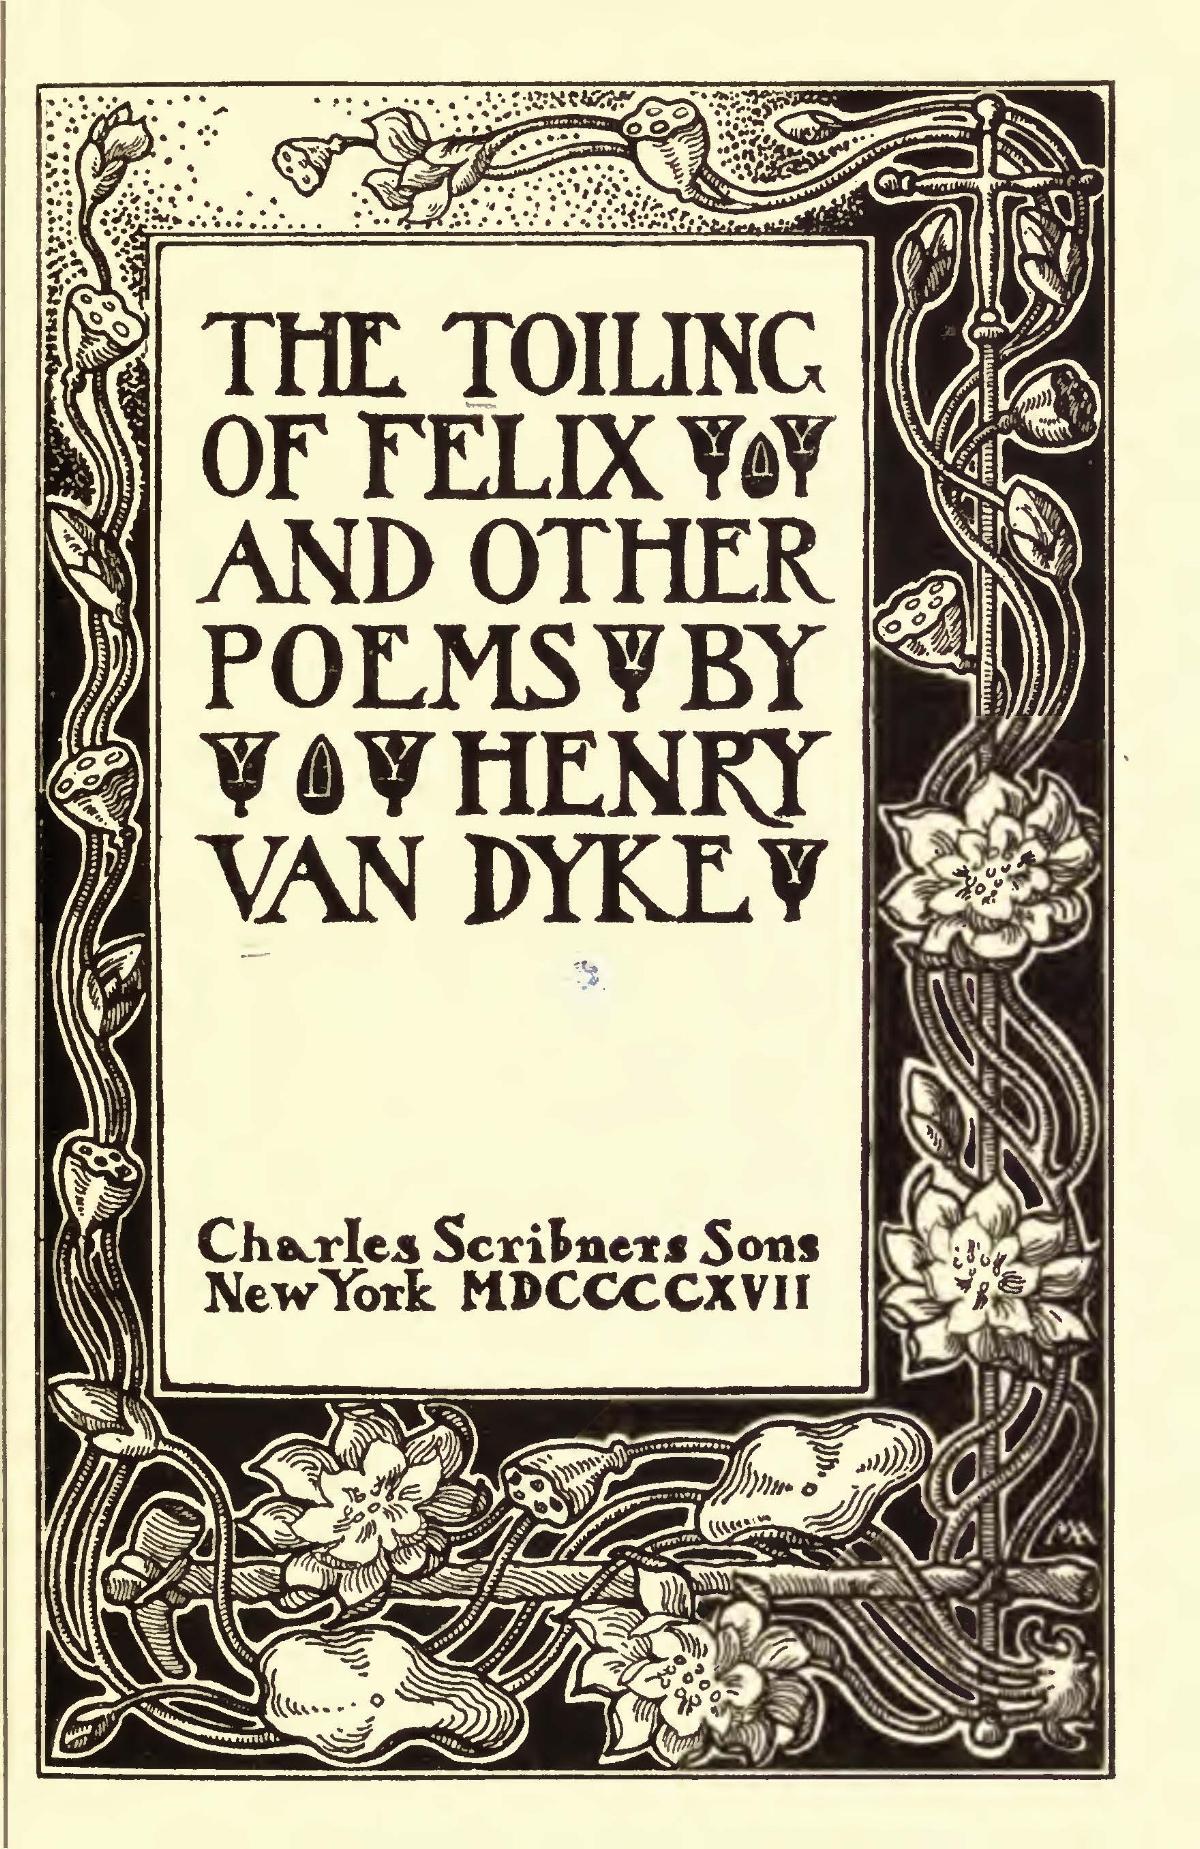 Van Dyke, Jr., Henry Jackson, The Toiling of Felix Title Page.jpg